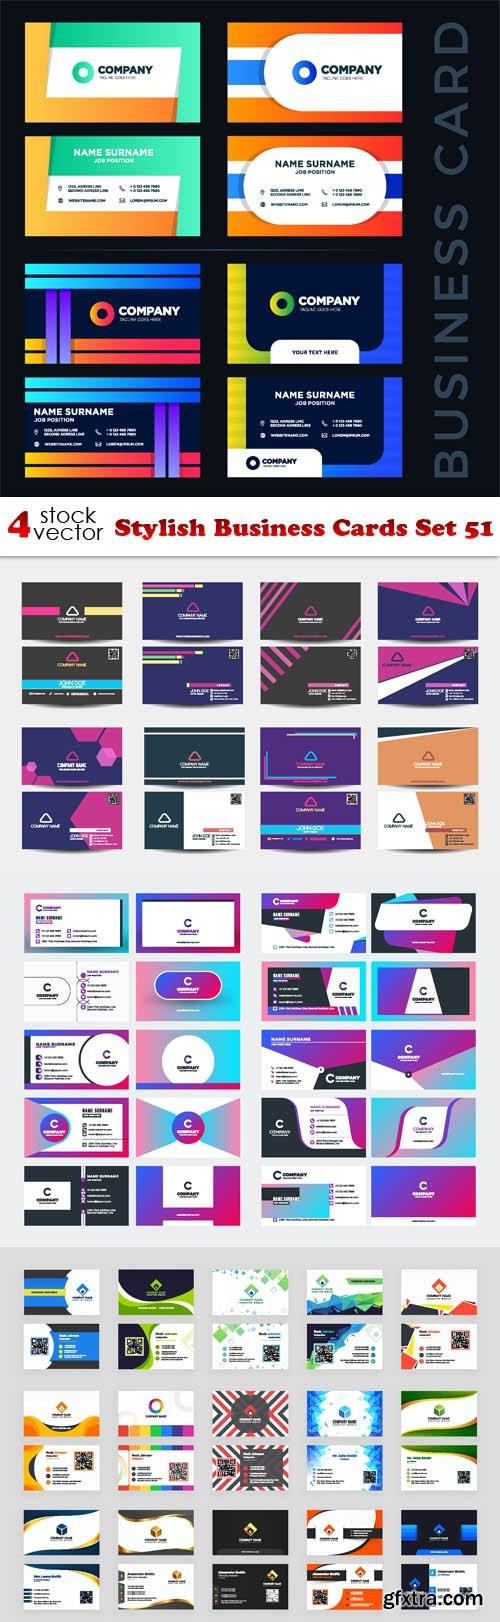 Vectors - Stylish Business Cards Set 51